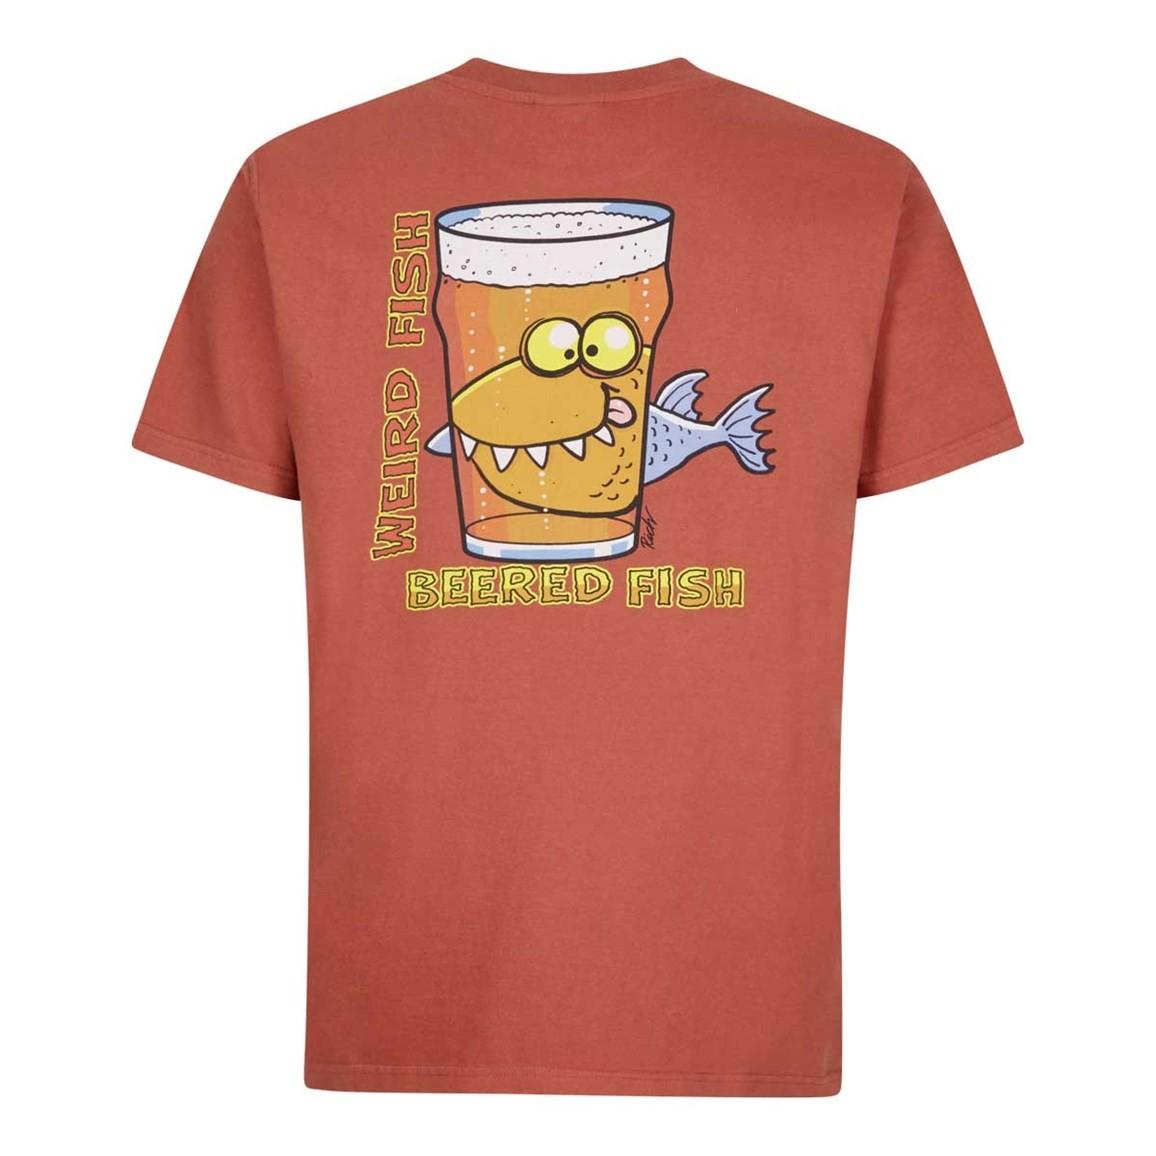 Weird Fish Beered Fish Artist T-Shirt Brick Red Size 2XL